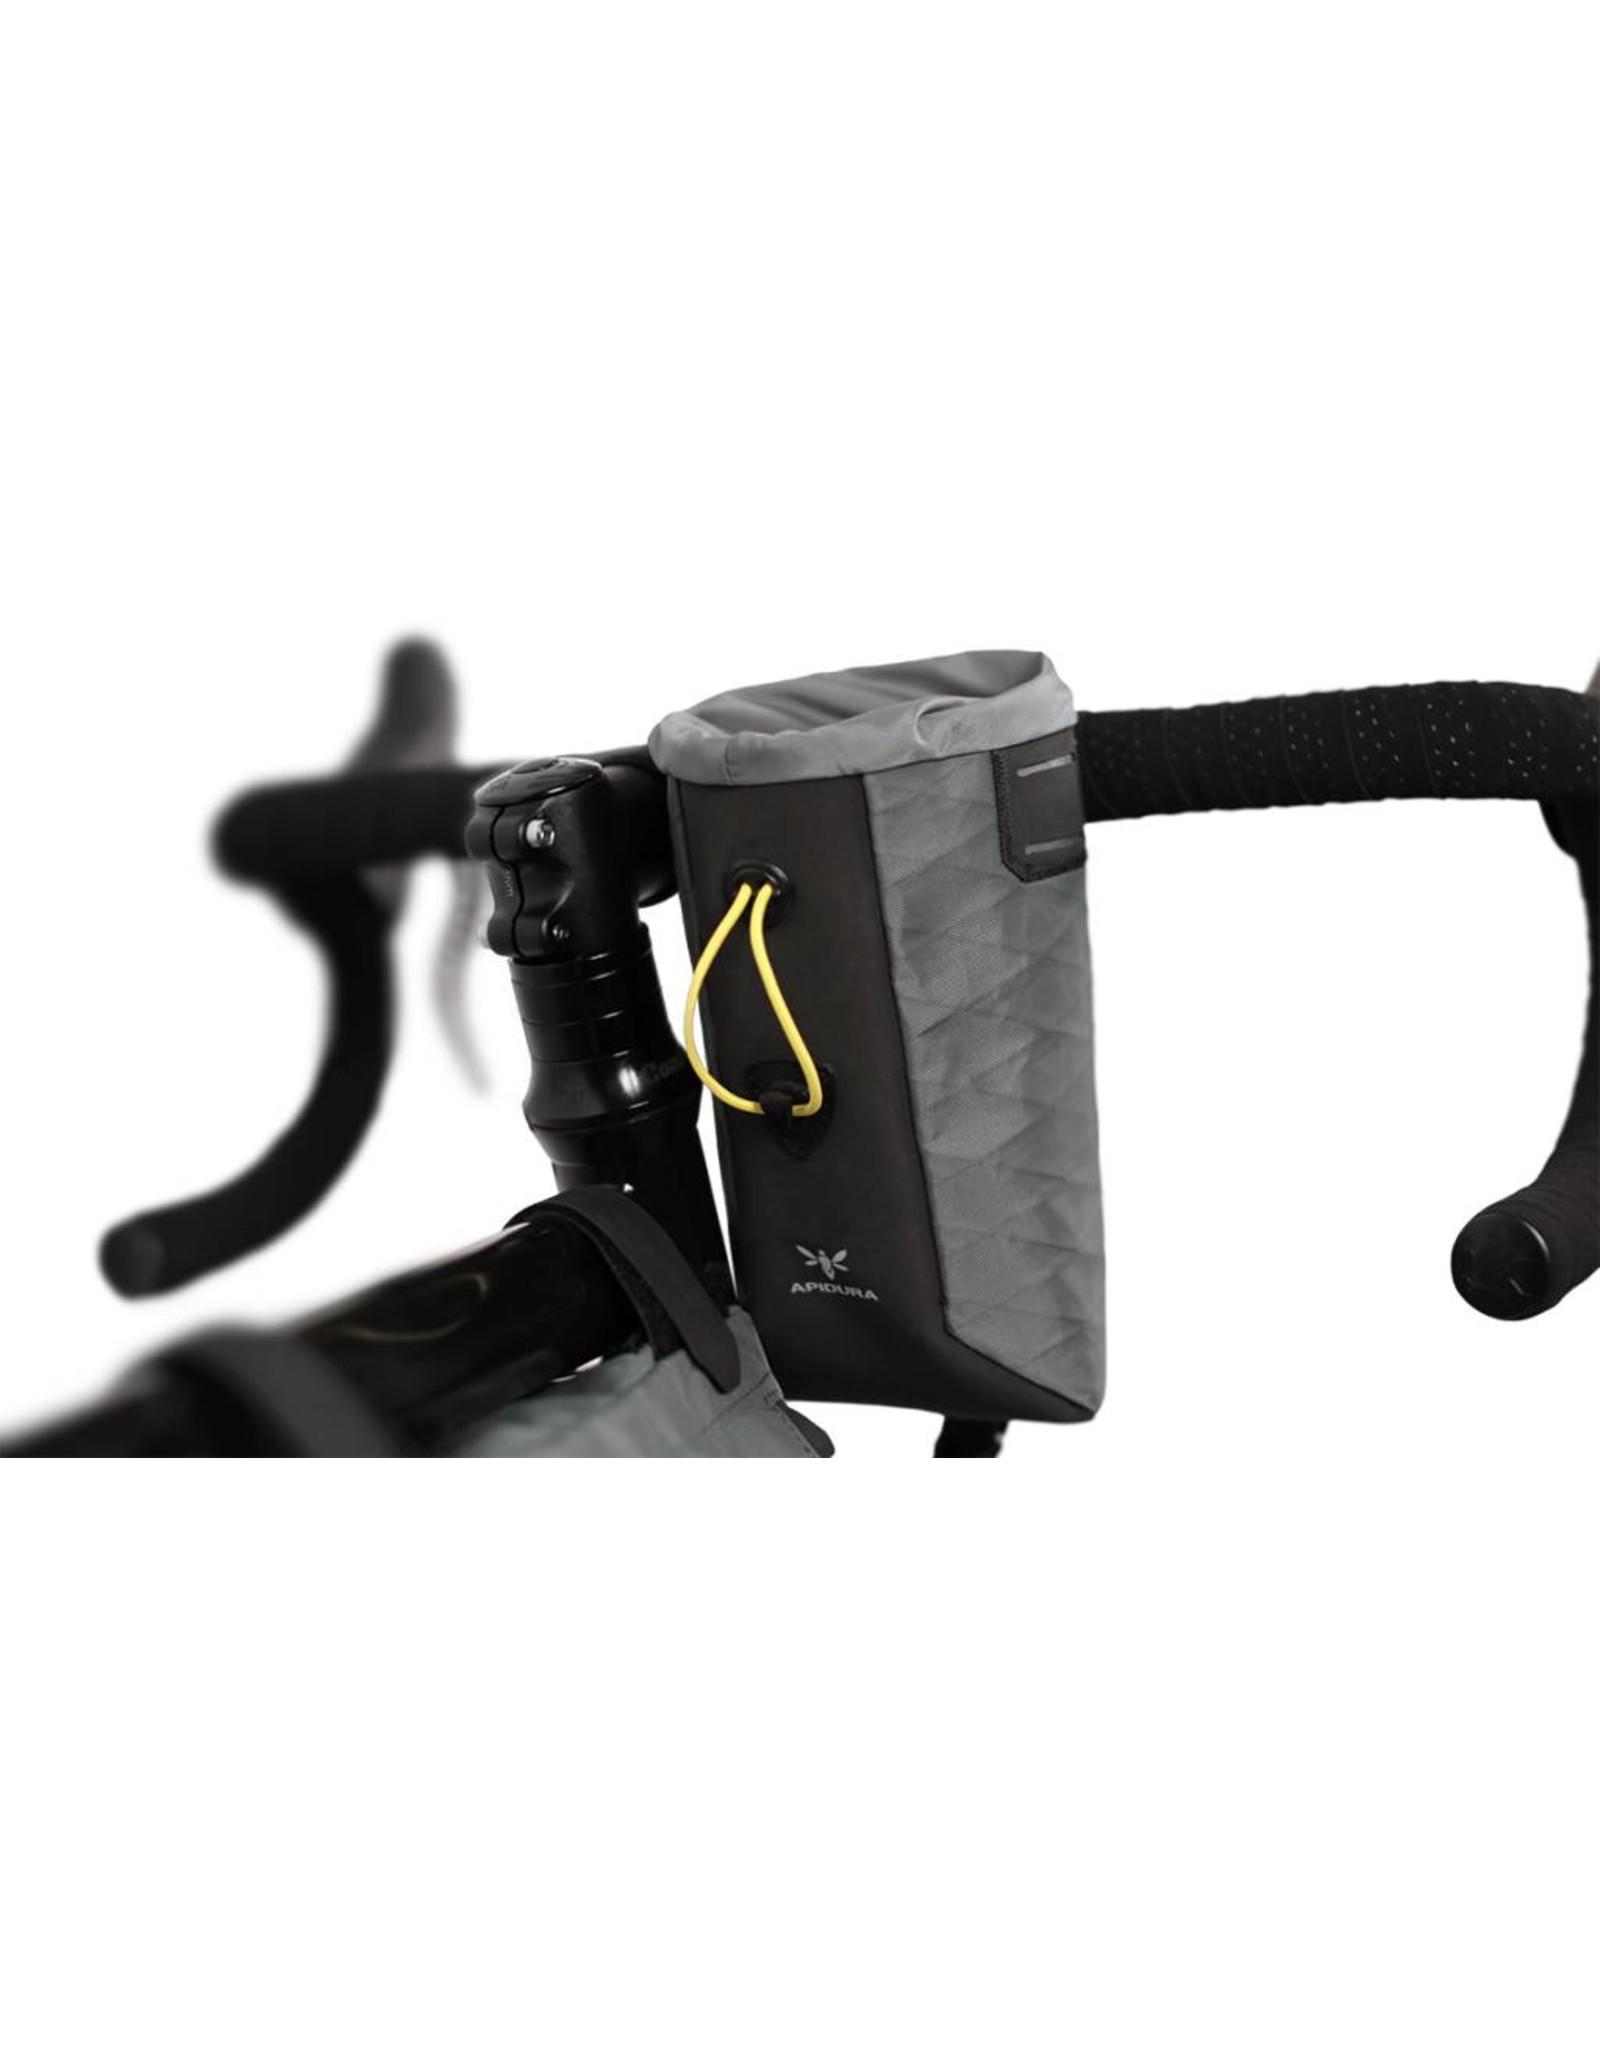 Apidura Apidura Front Food Pouch Extended size 1.2 litre (touring/bikepacking/randonneur/commuter bag)